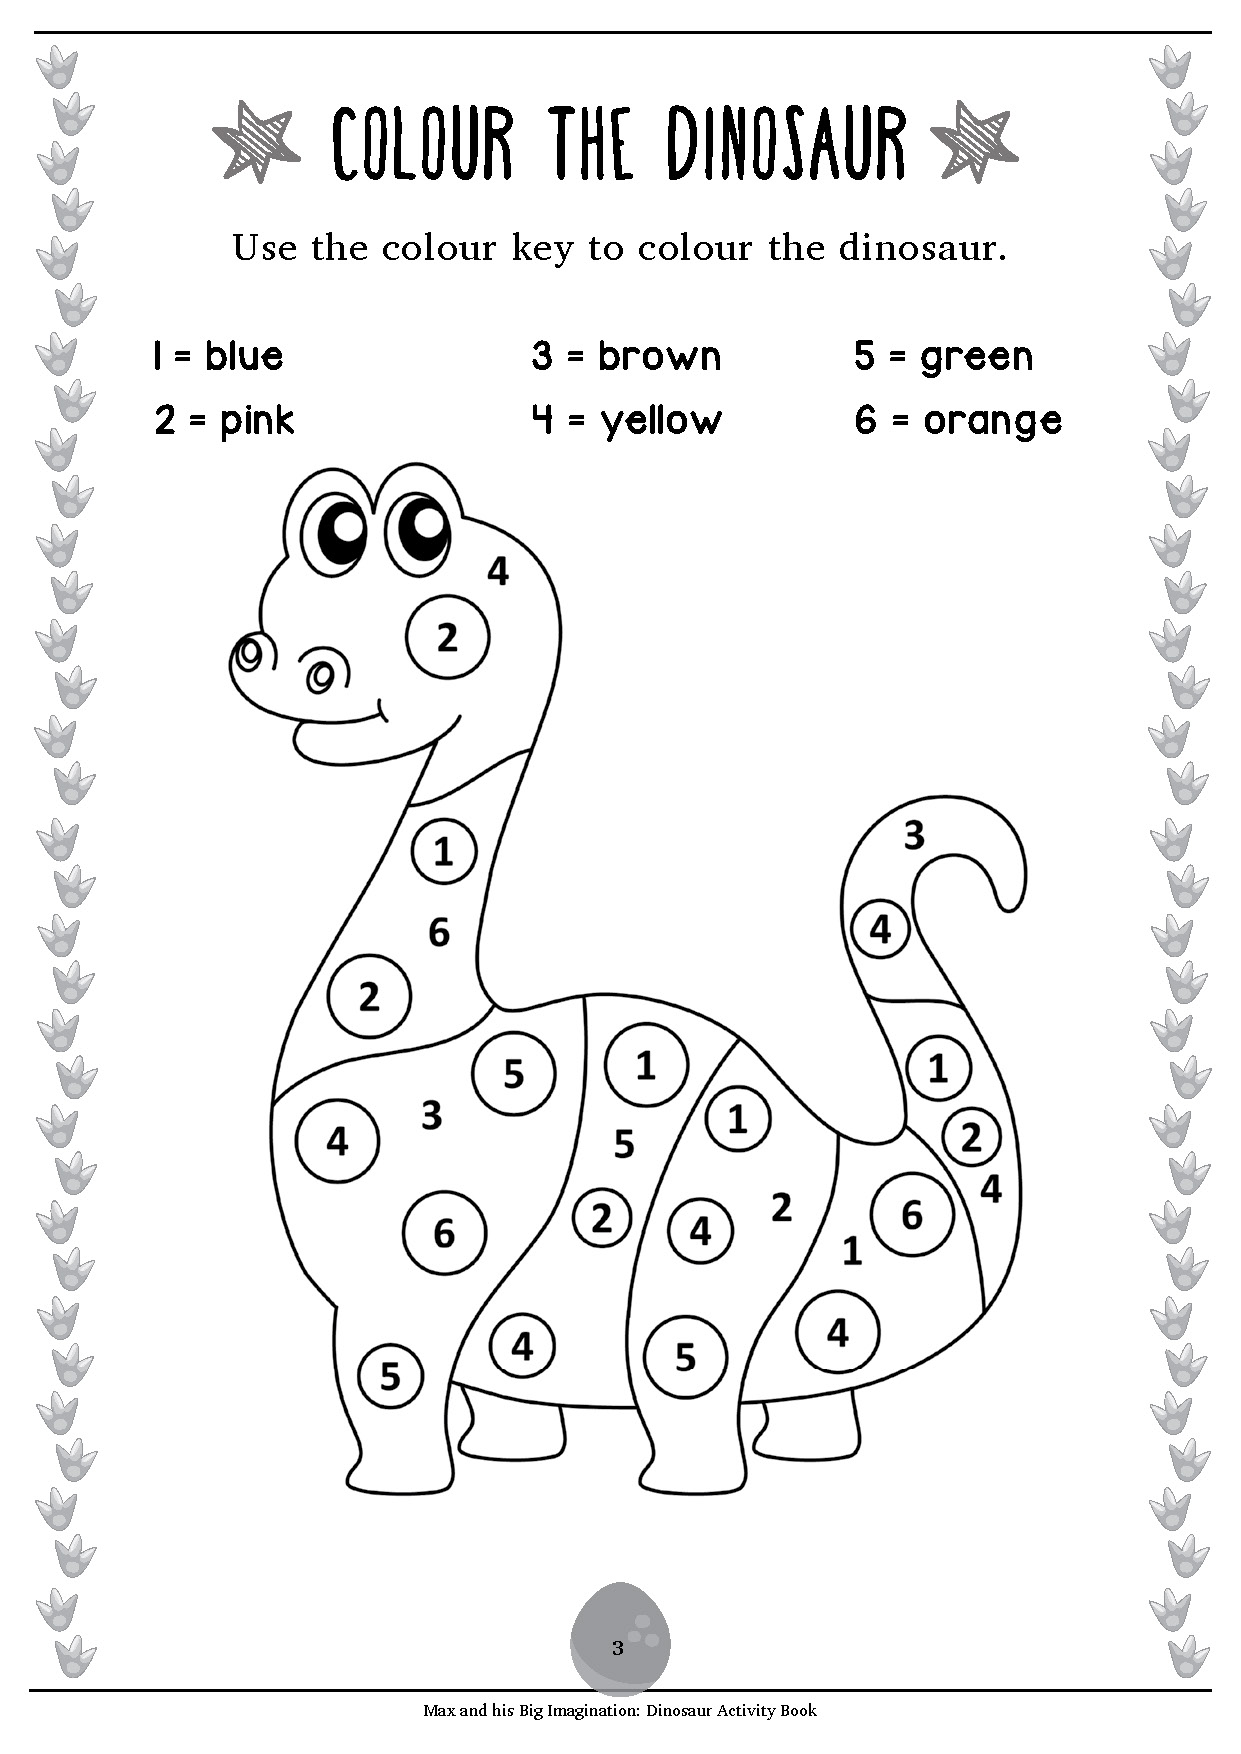 Max Free Activity Worksheet: Dinosaur Activity Book Sample 2 ...